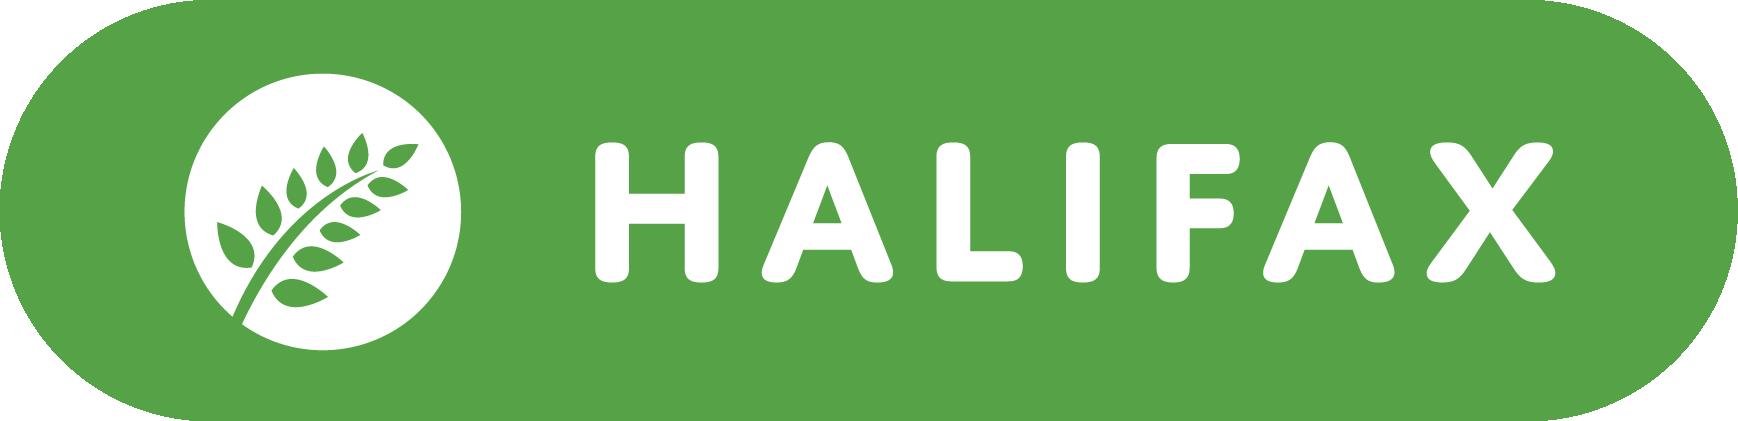 Halifax Warranty Portal